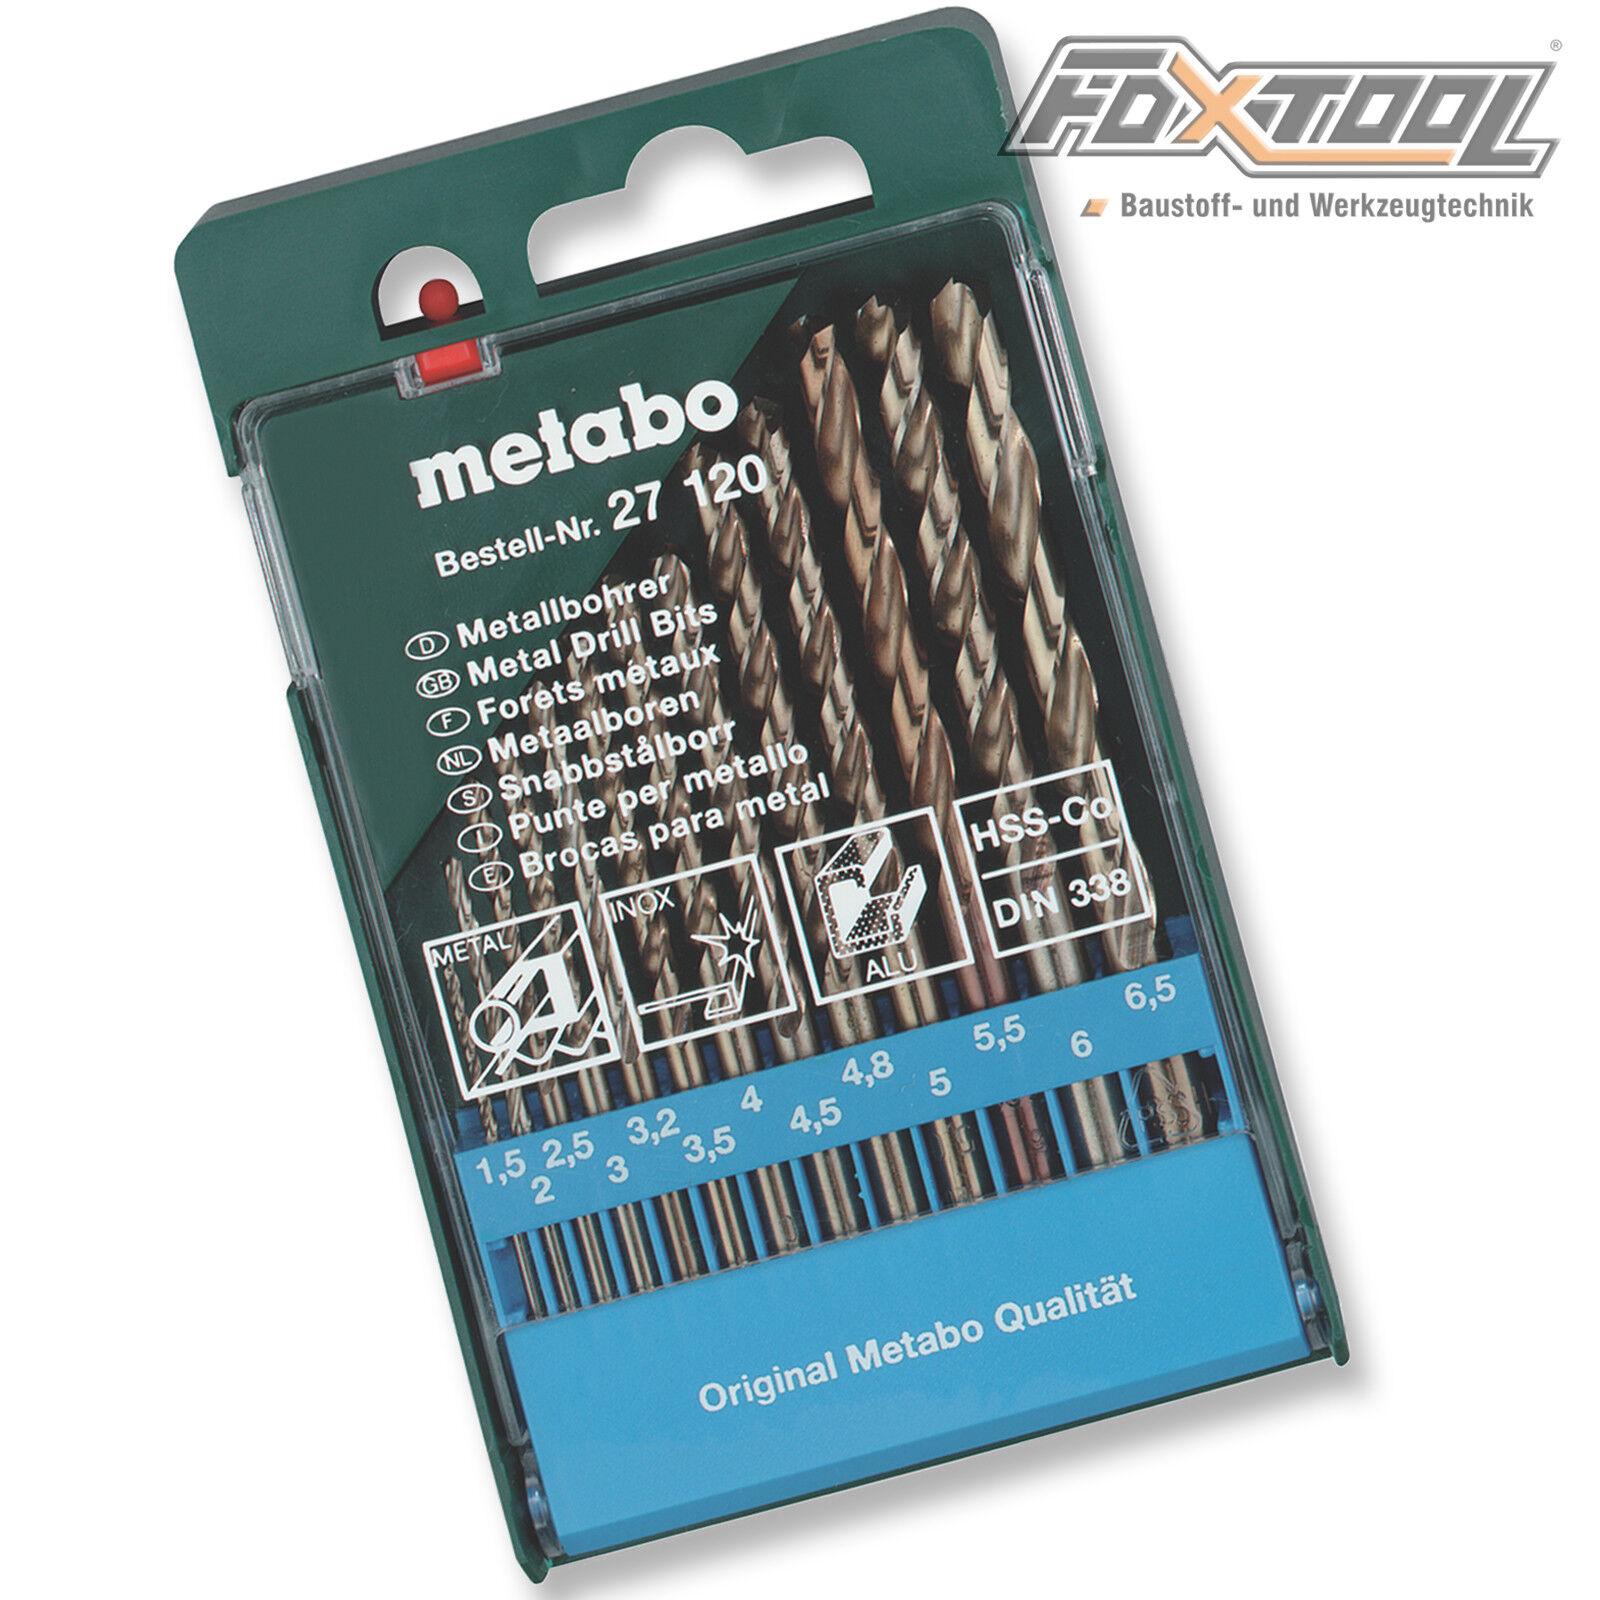 Metabo Metallbohrer-Box HSS-Co DIN338 Stahl Metall Bohrer Kassette 13-teilig